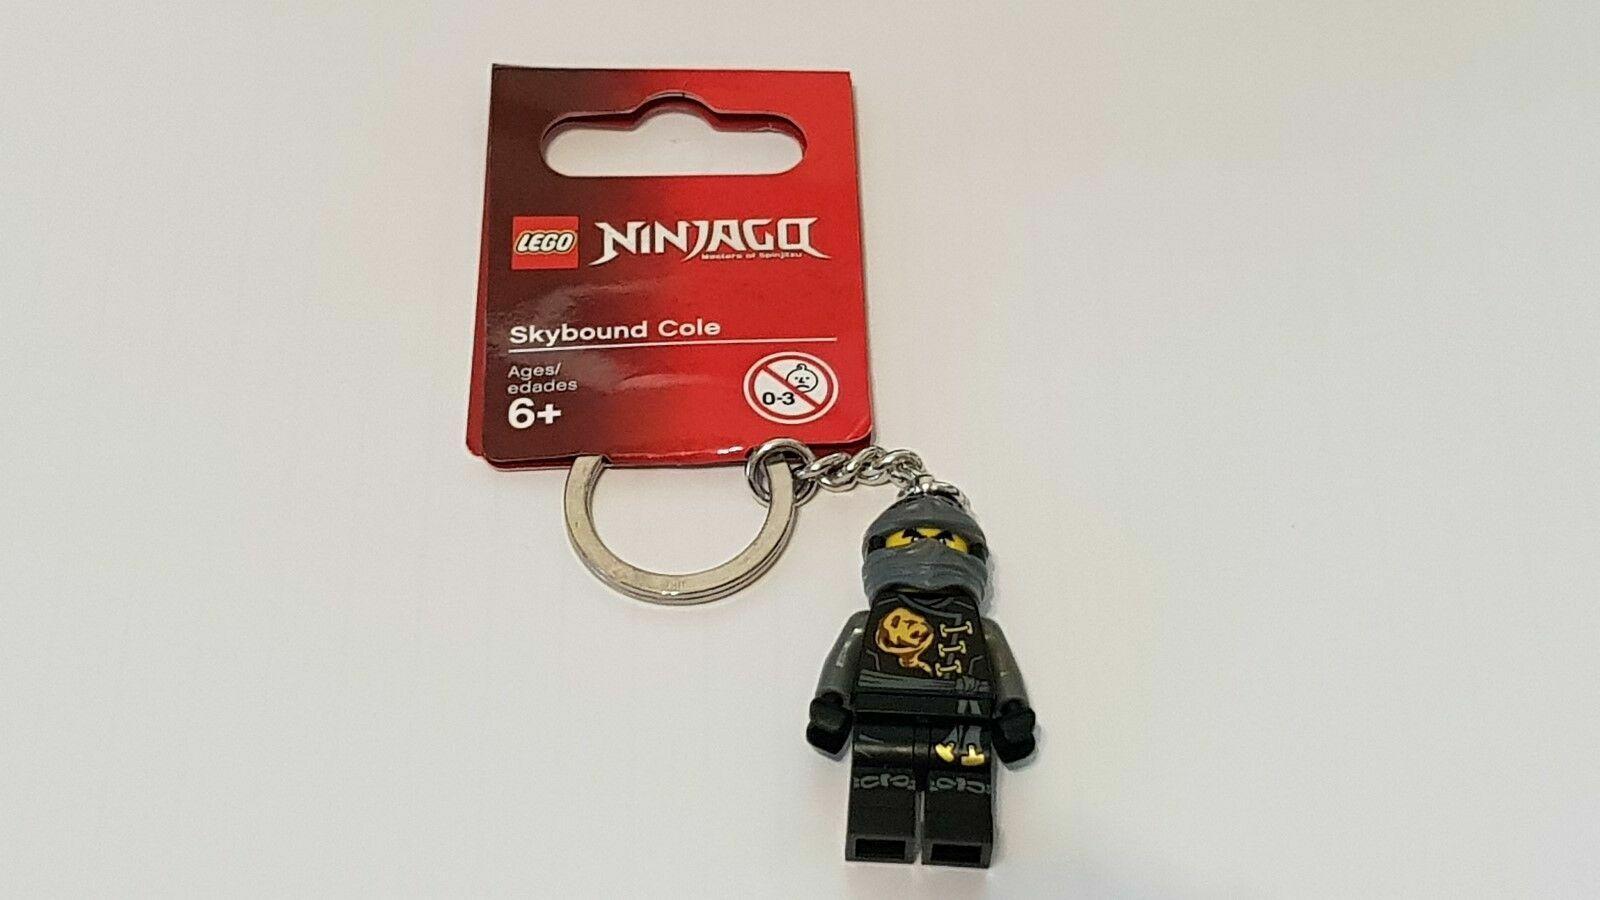 2016 - Ninjago Skybound Cole Keyring Brand New Lego 853538